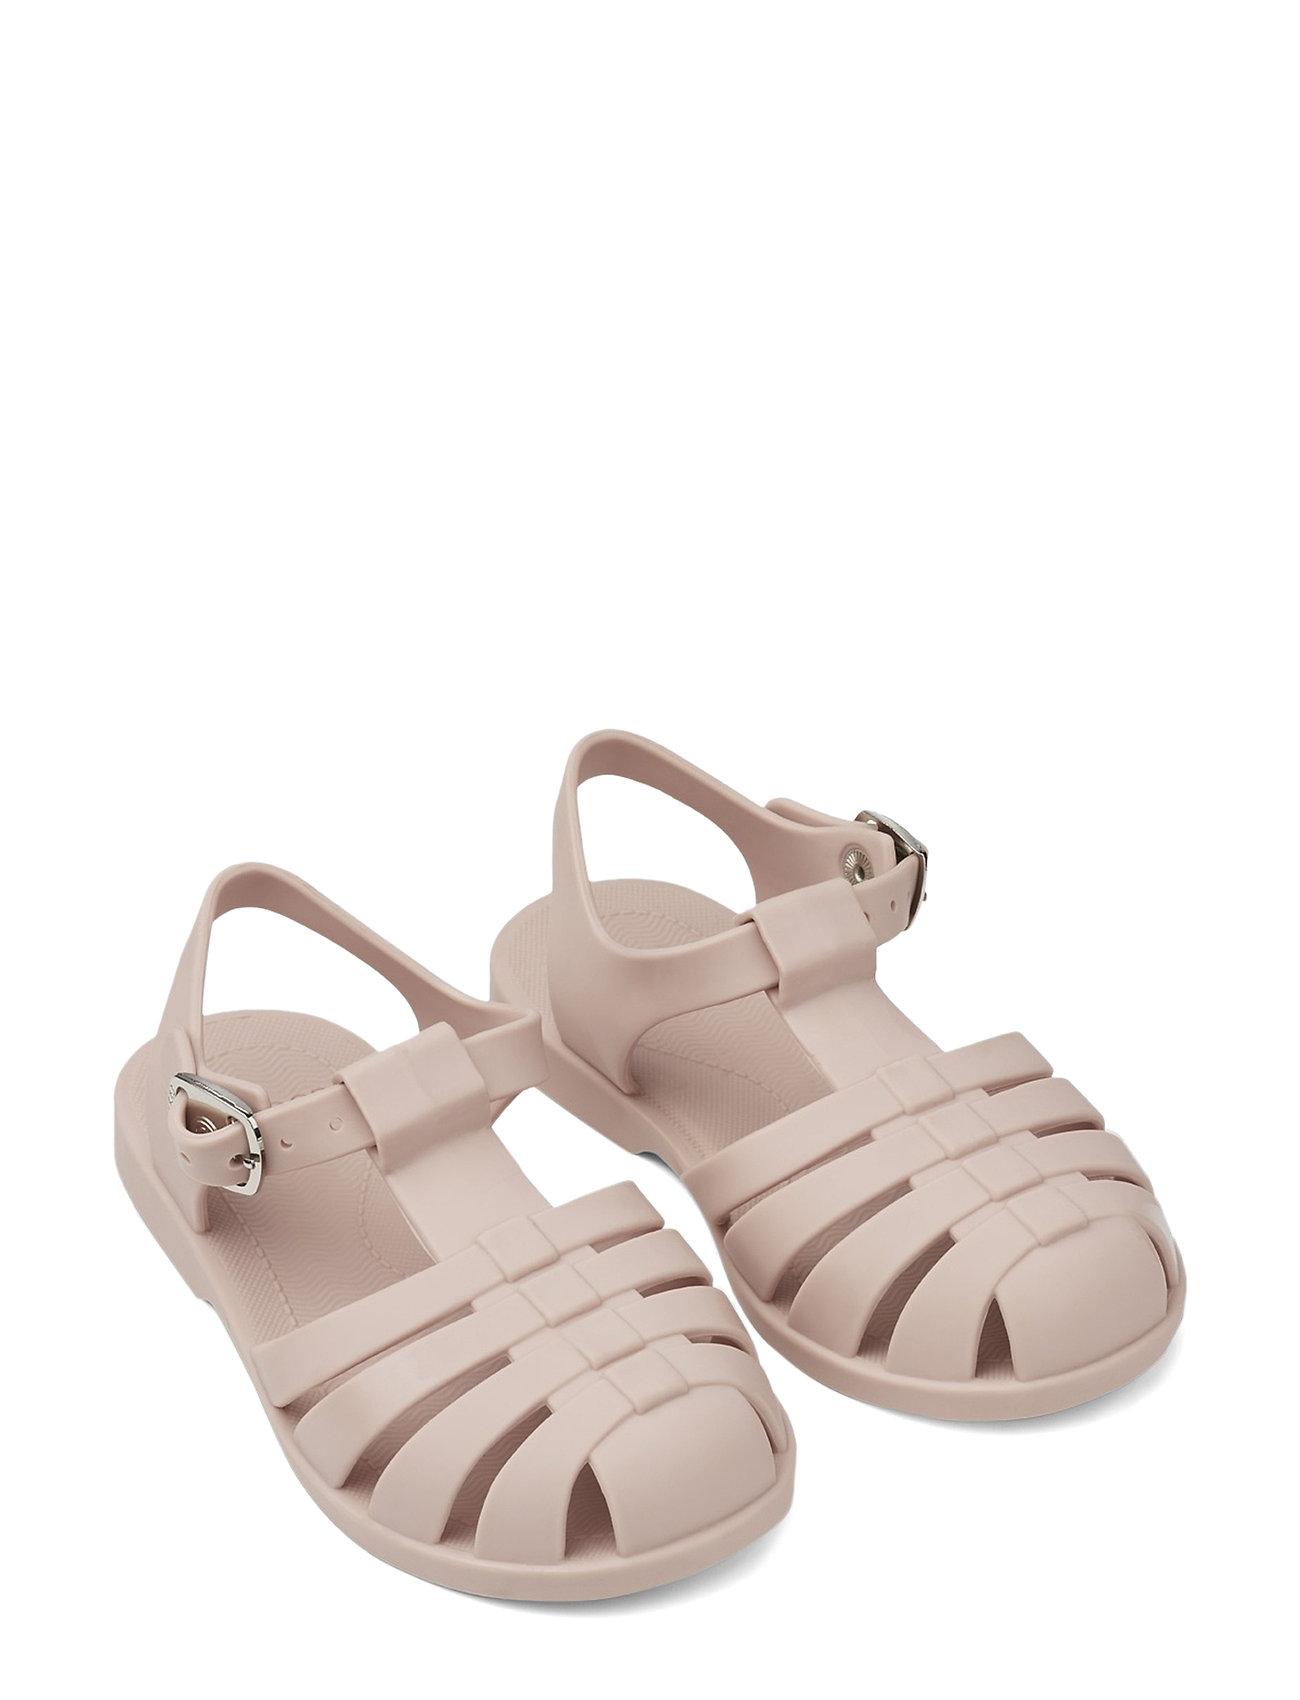 Liewood Bre Sandals Sandaalit Vaaleanpunainen Liewood ROSE